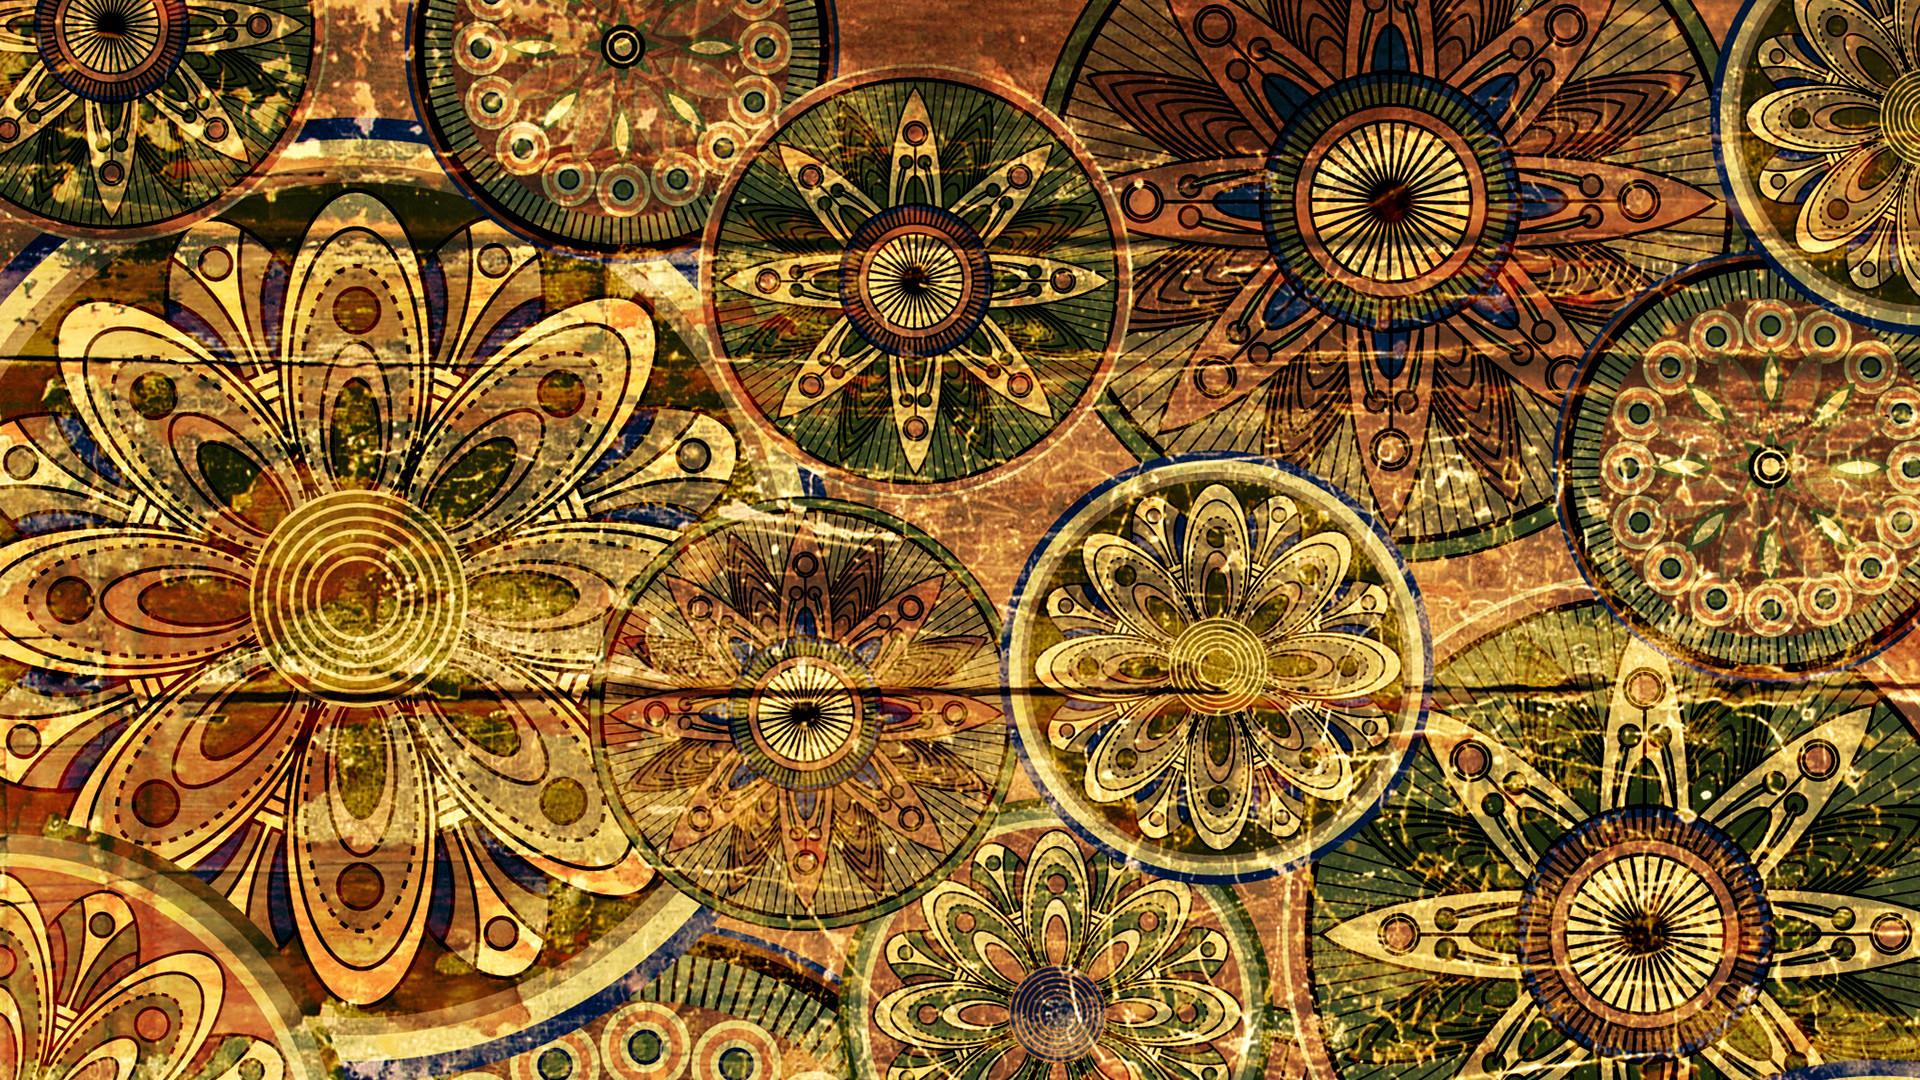 Free Hd Wallpapers Absract Wallpapers Desktop Wallpapers: Tapestry Wallpaper Desktop ·① WallpaperTag